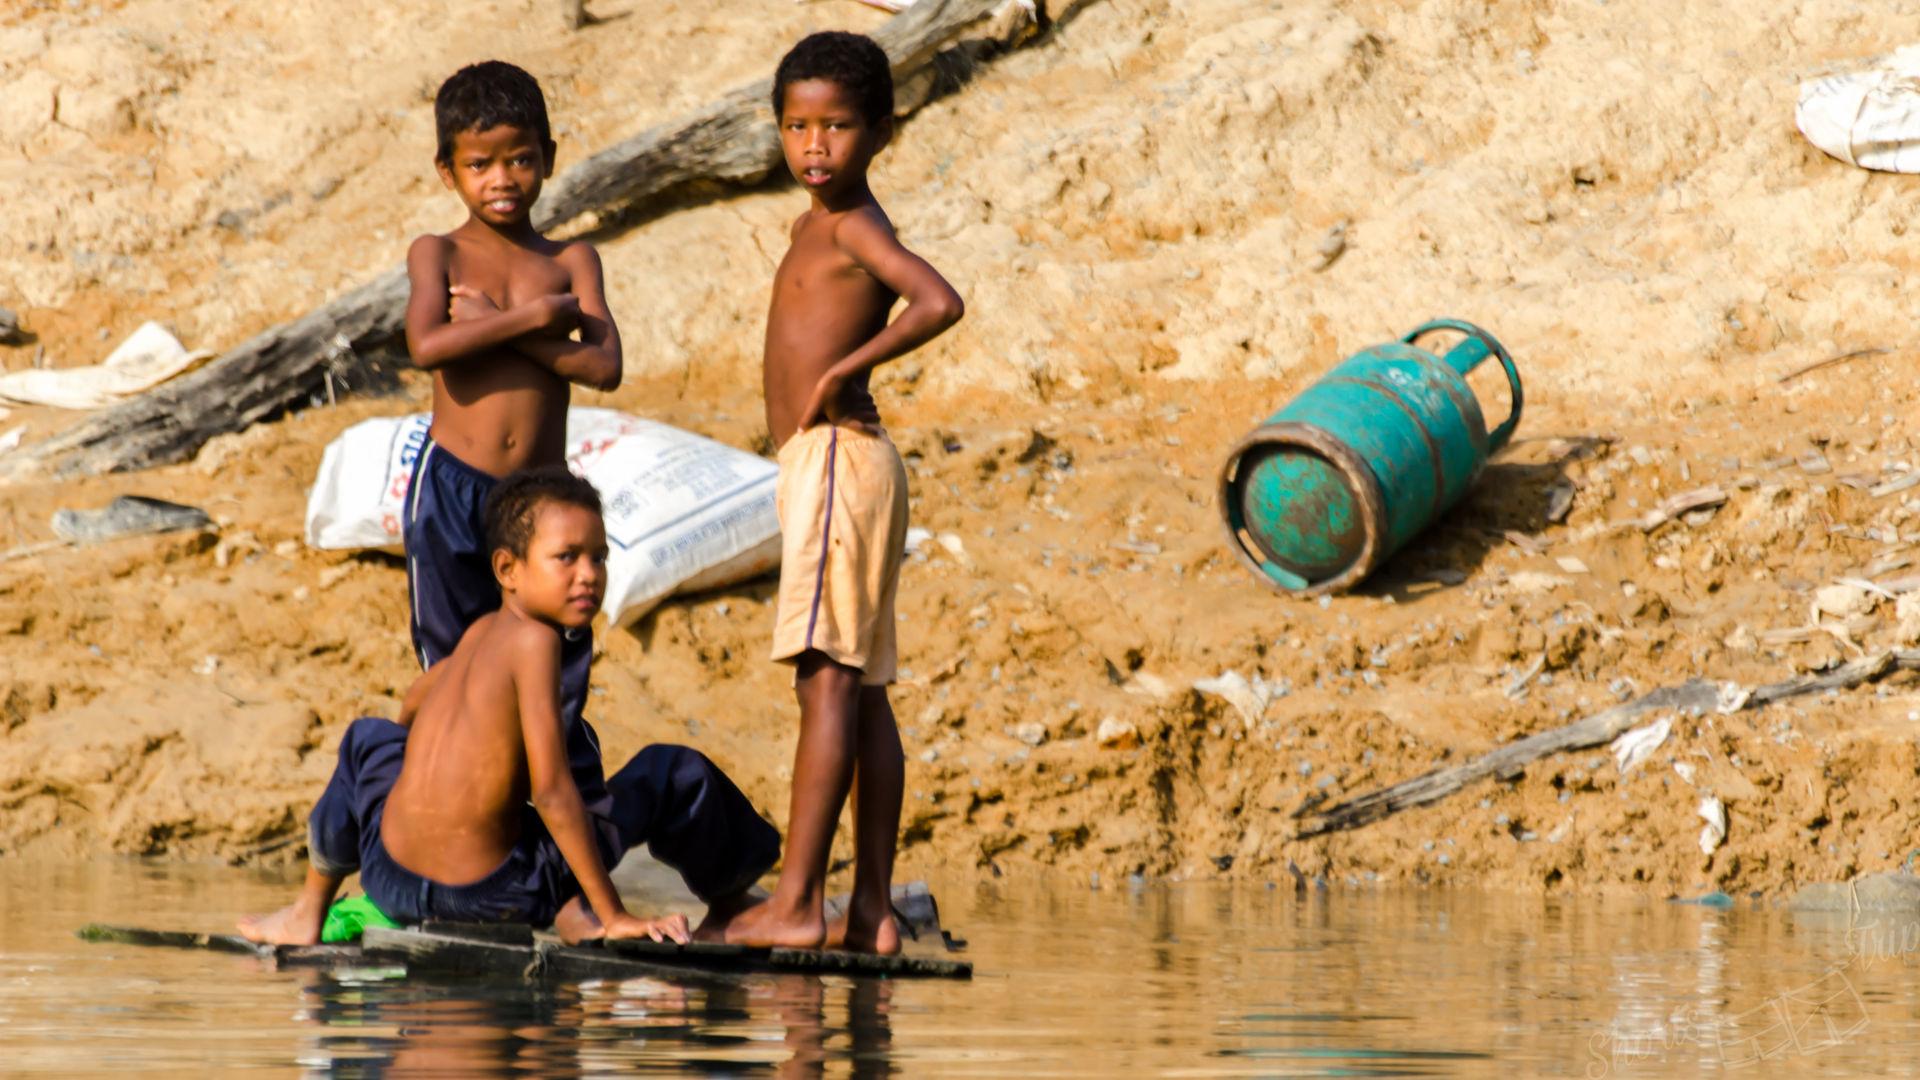 asli kids, asli people, asli malaysia, aborigine people malaysia